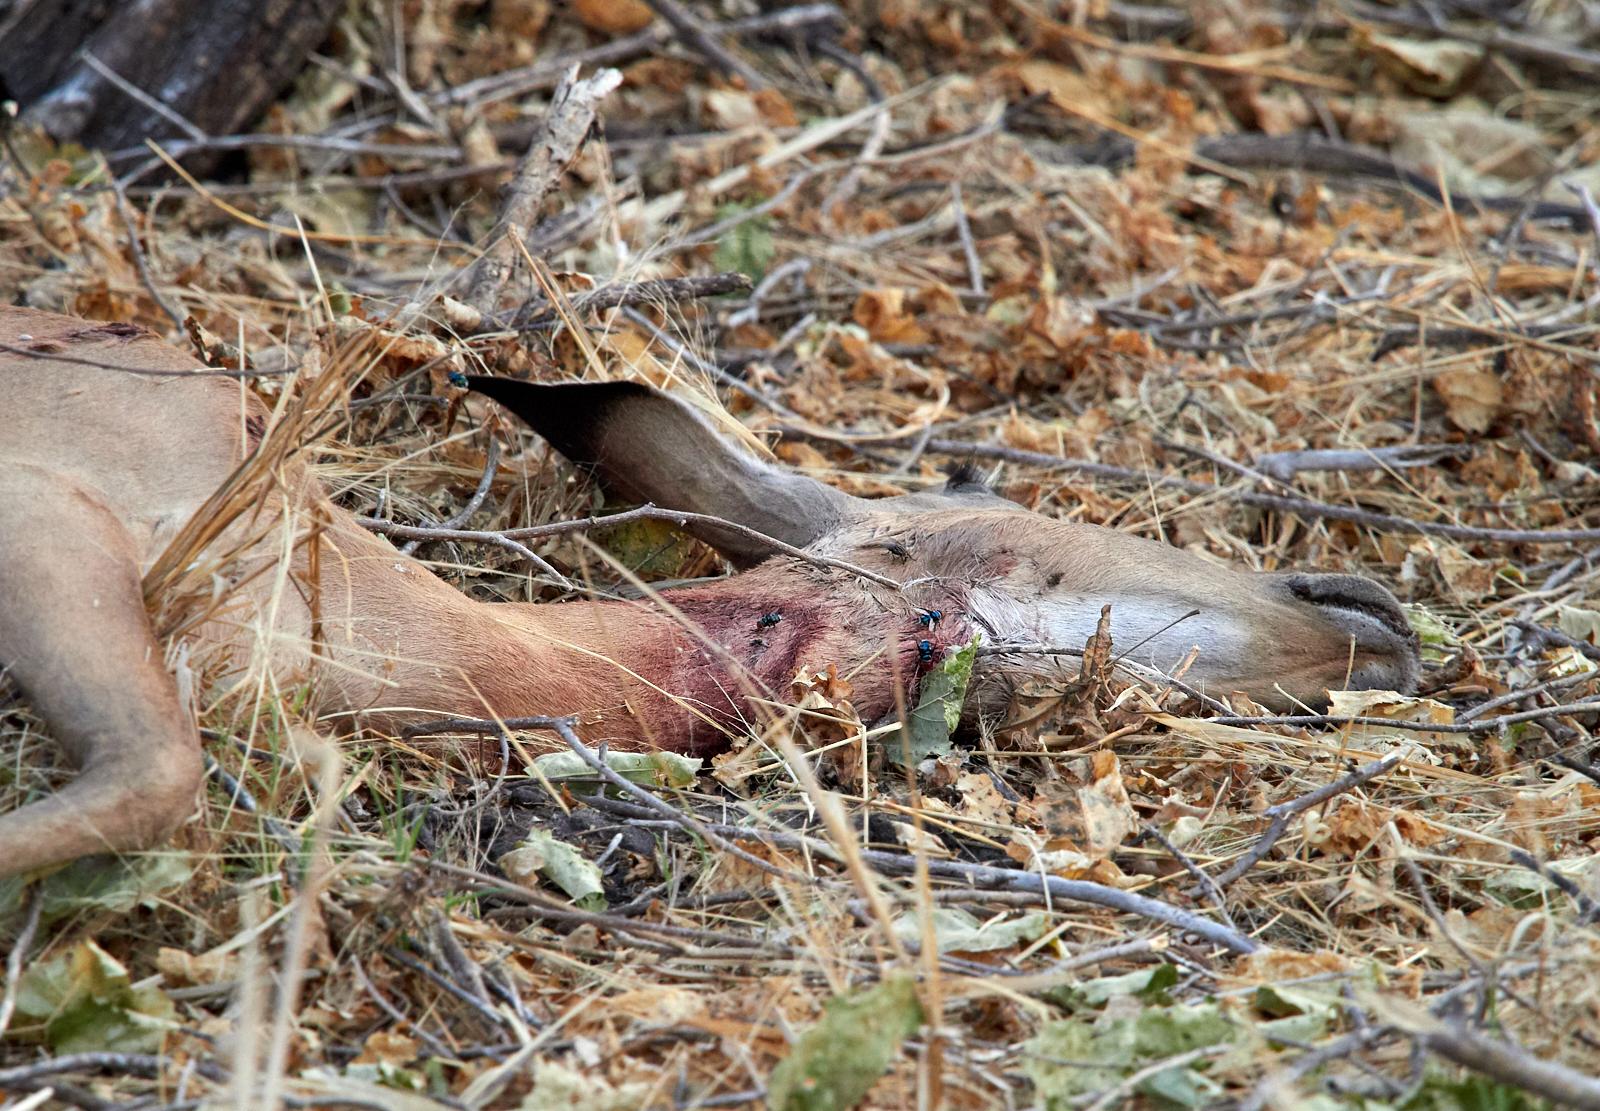 Dead impala 2 1600x1200 sRGB 1.jpg